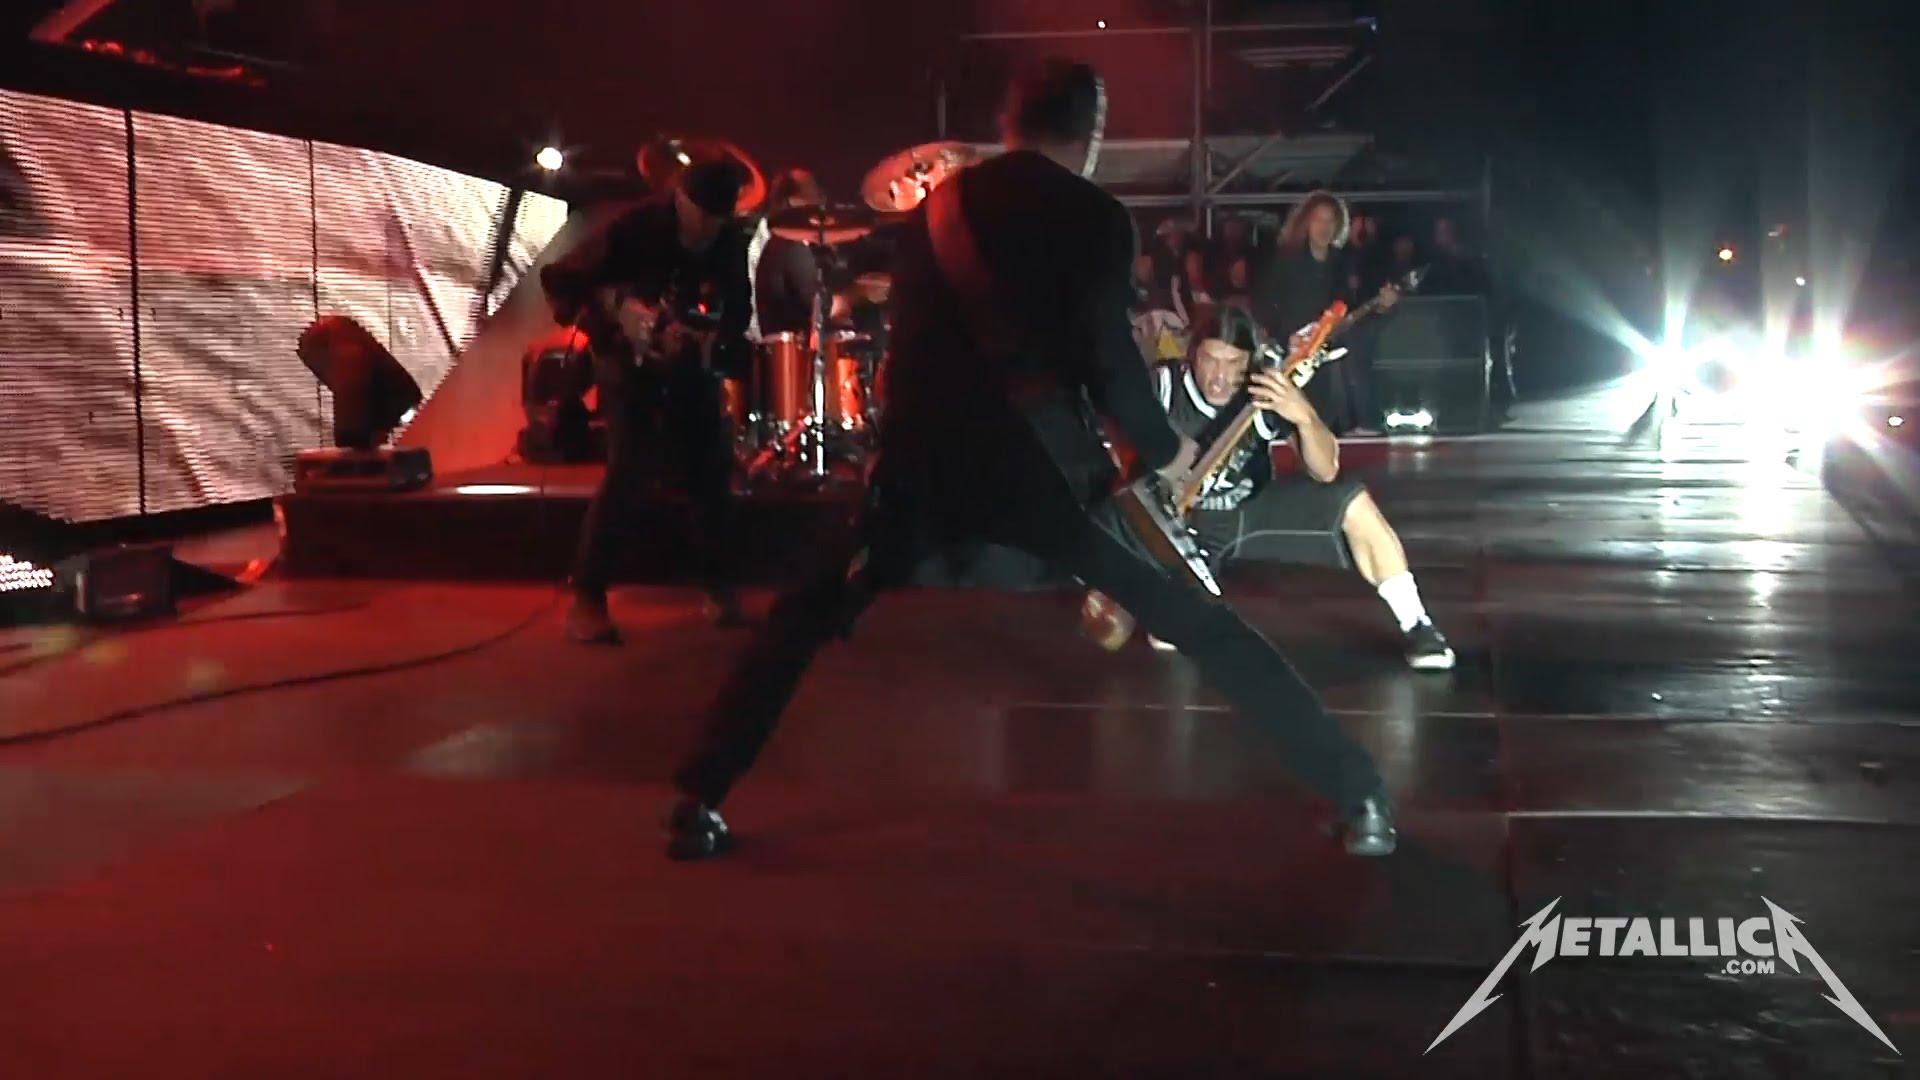 Metallica Ride the Lightning & For Whom the Bell Tolls (MetOnTour - Quito, Ecuador - 2014)